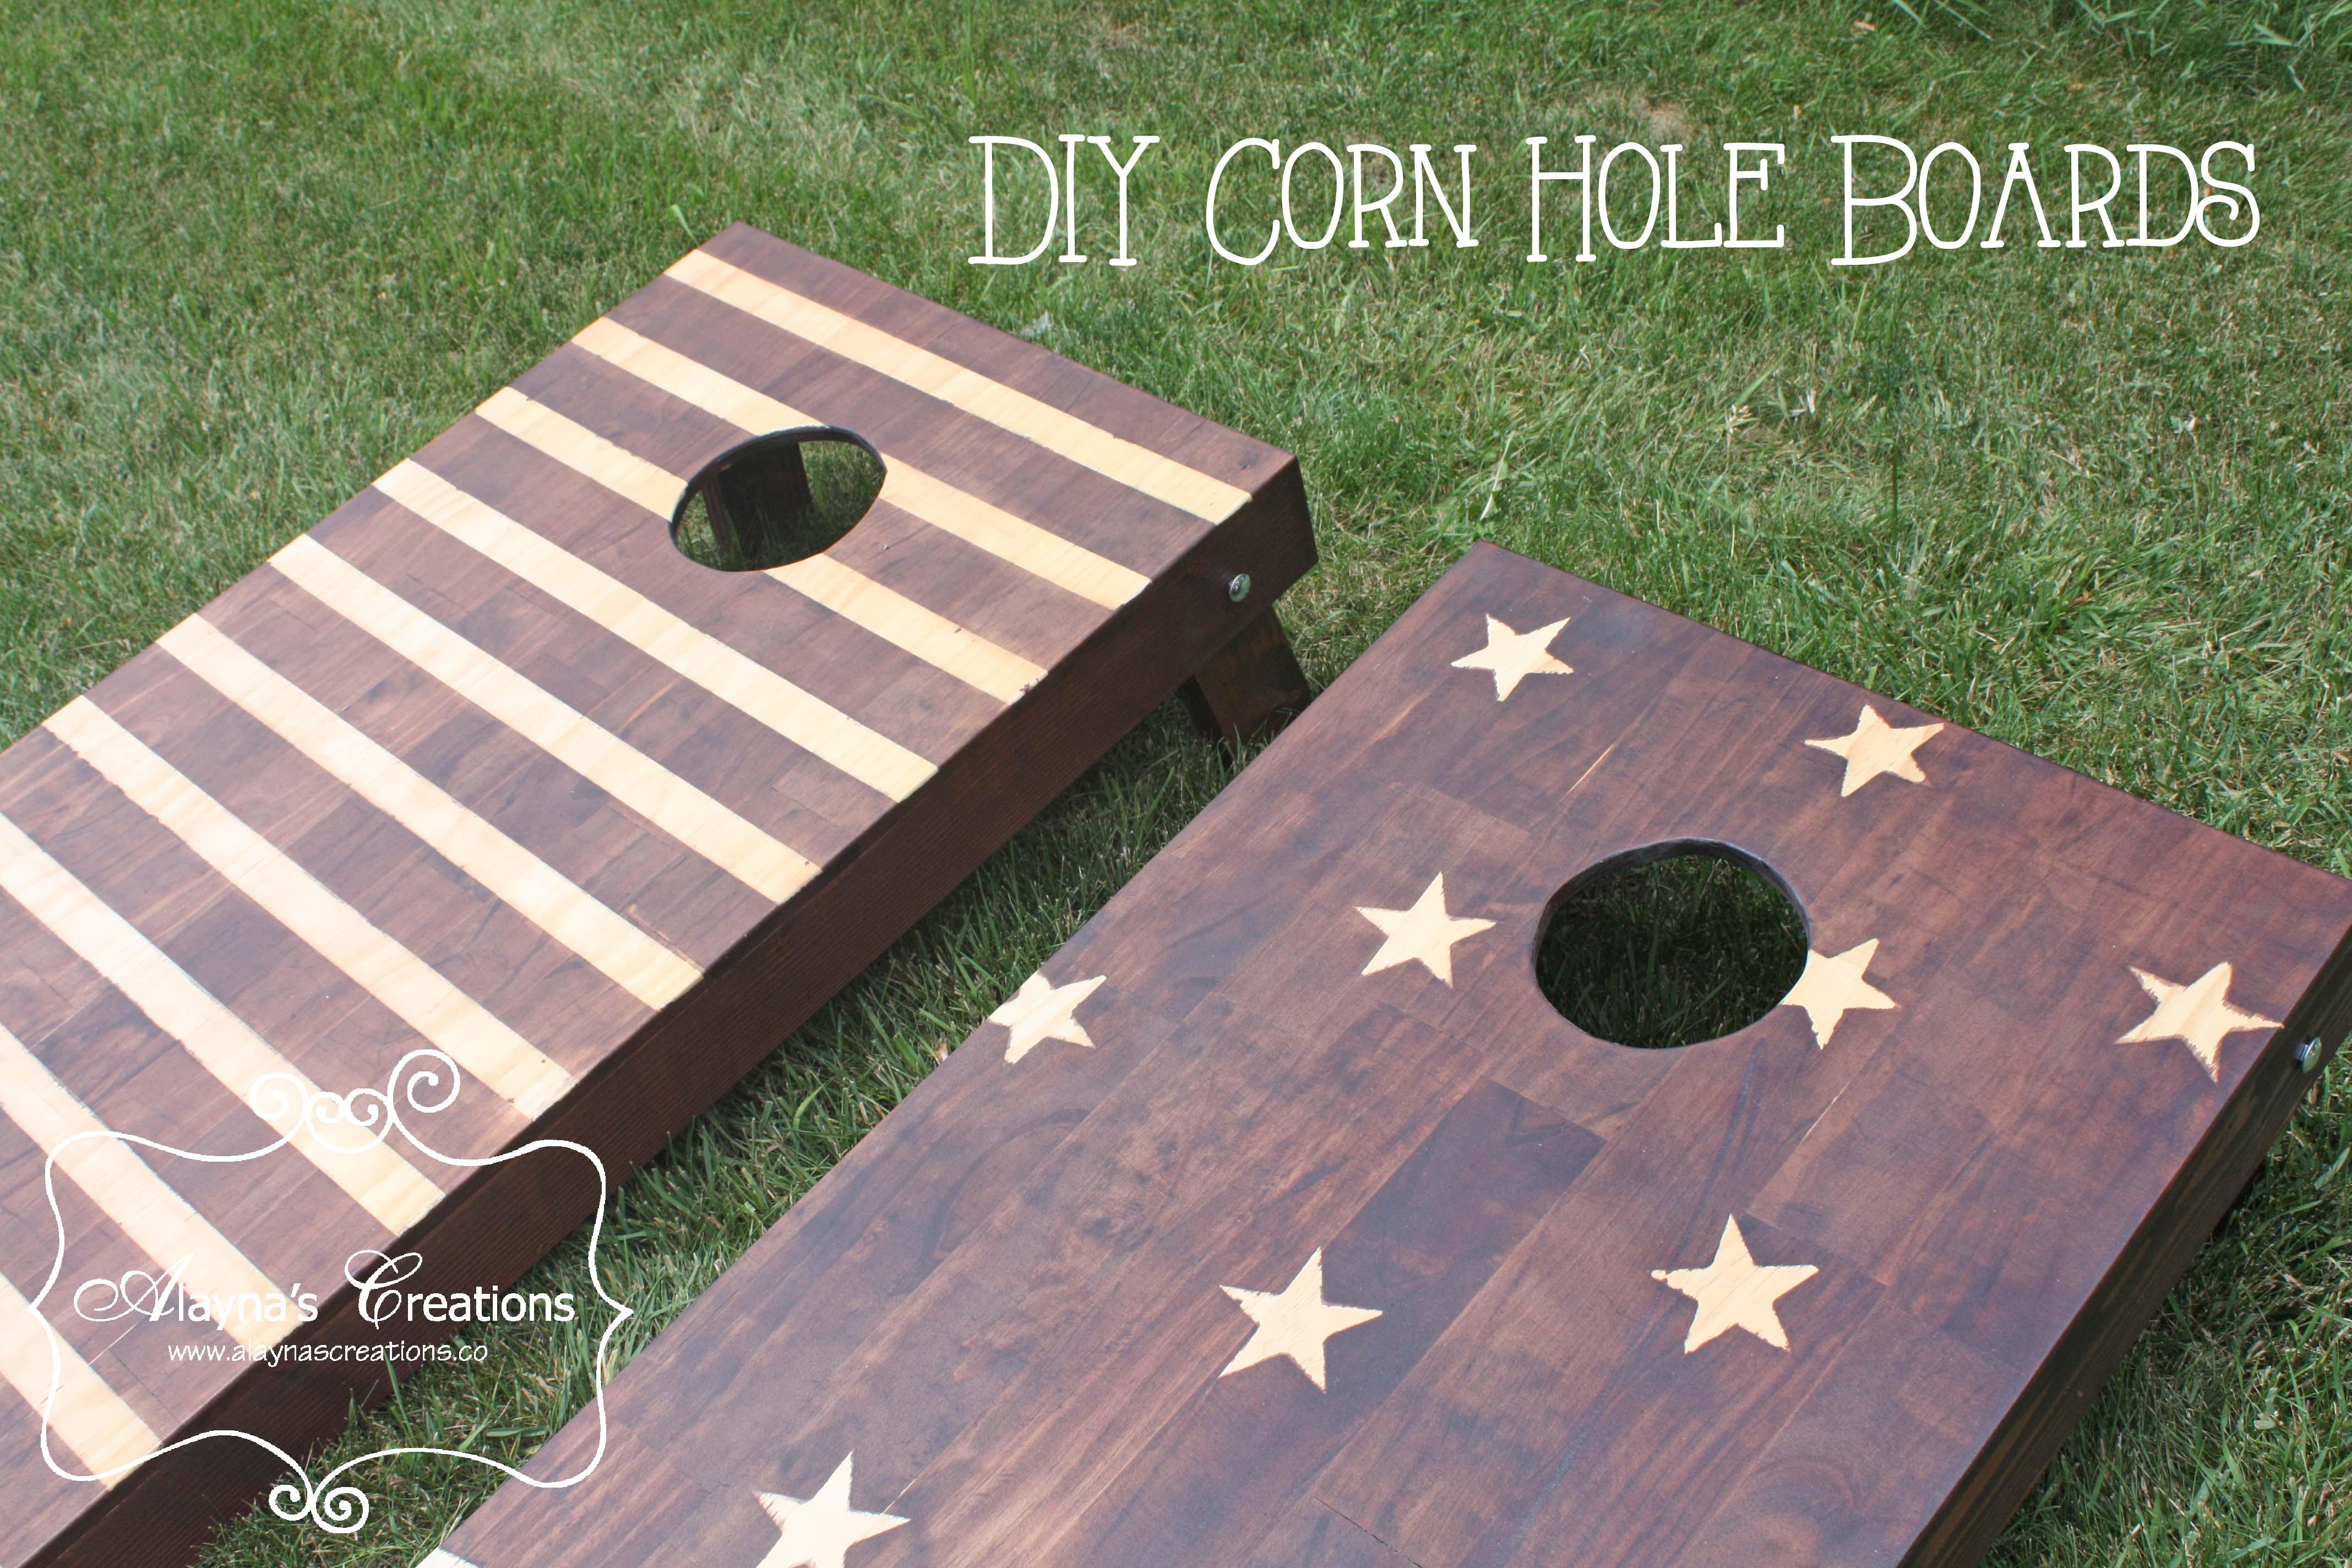 stars and stripes corn hole boards diy tutorial - Cornhole Design Ideas